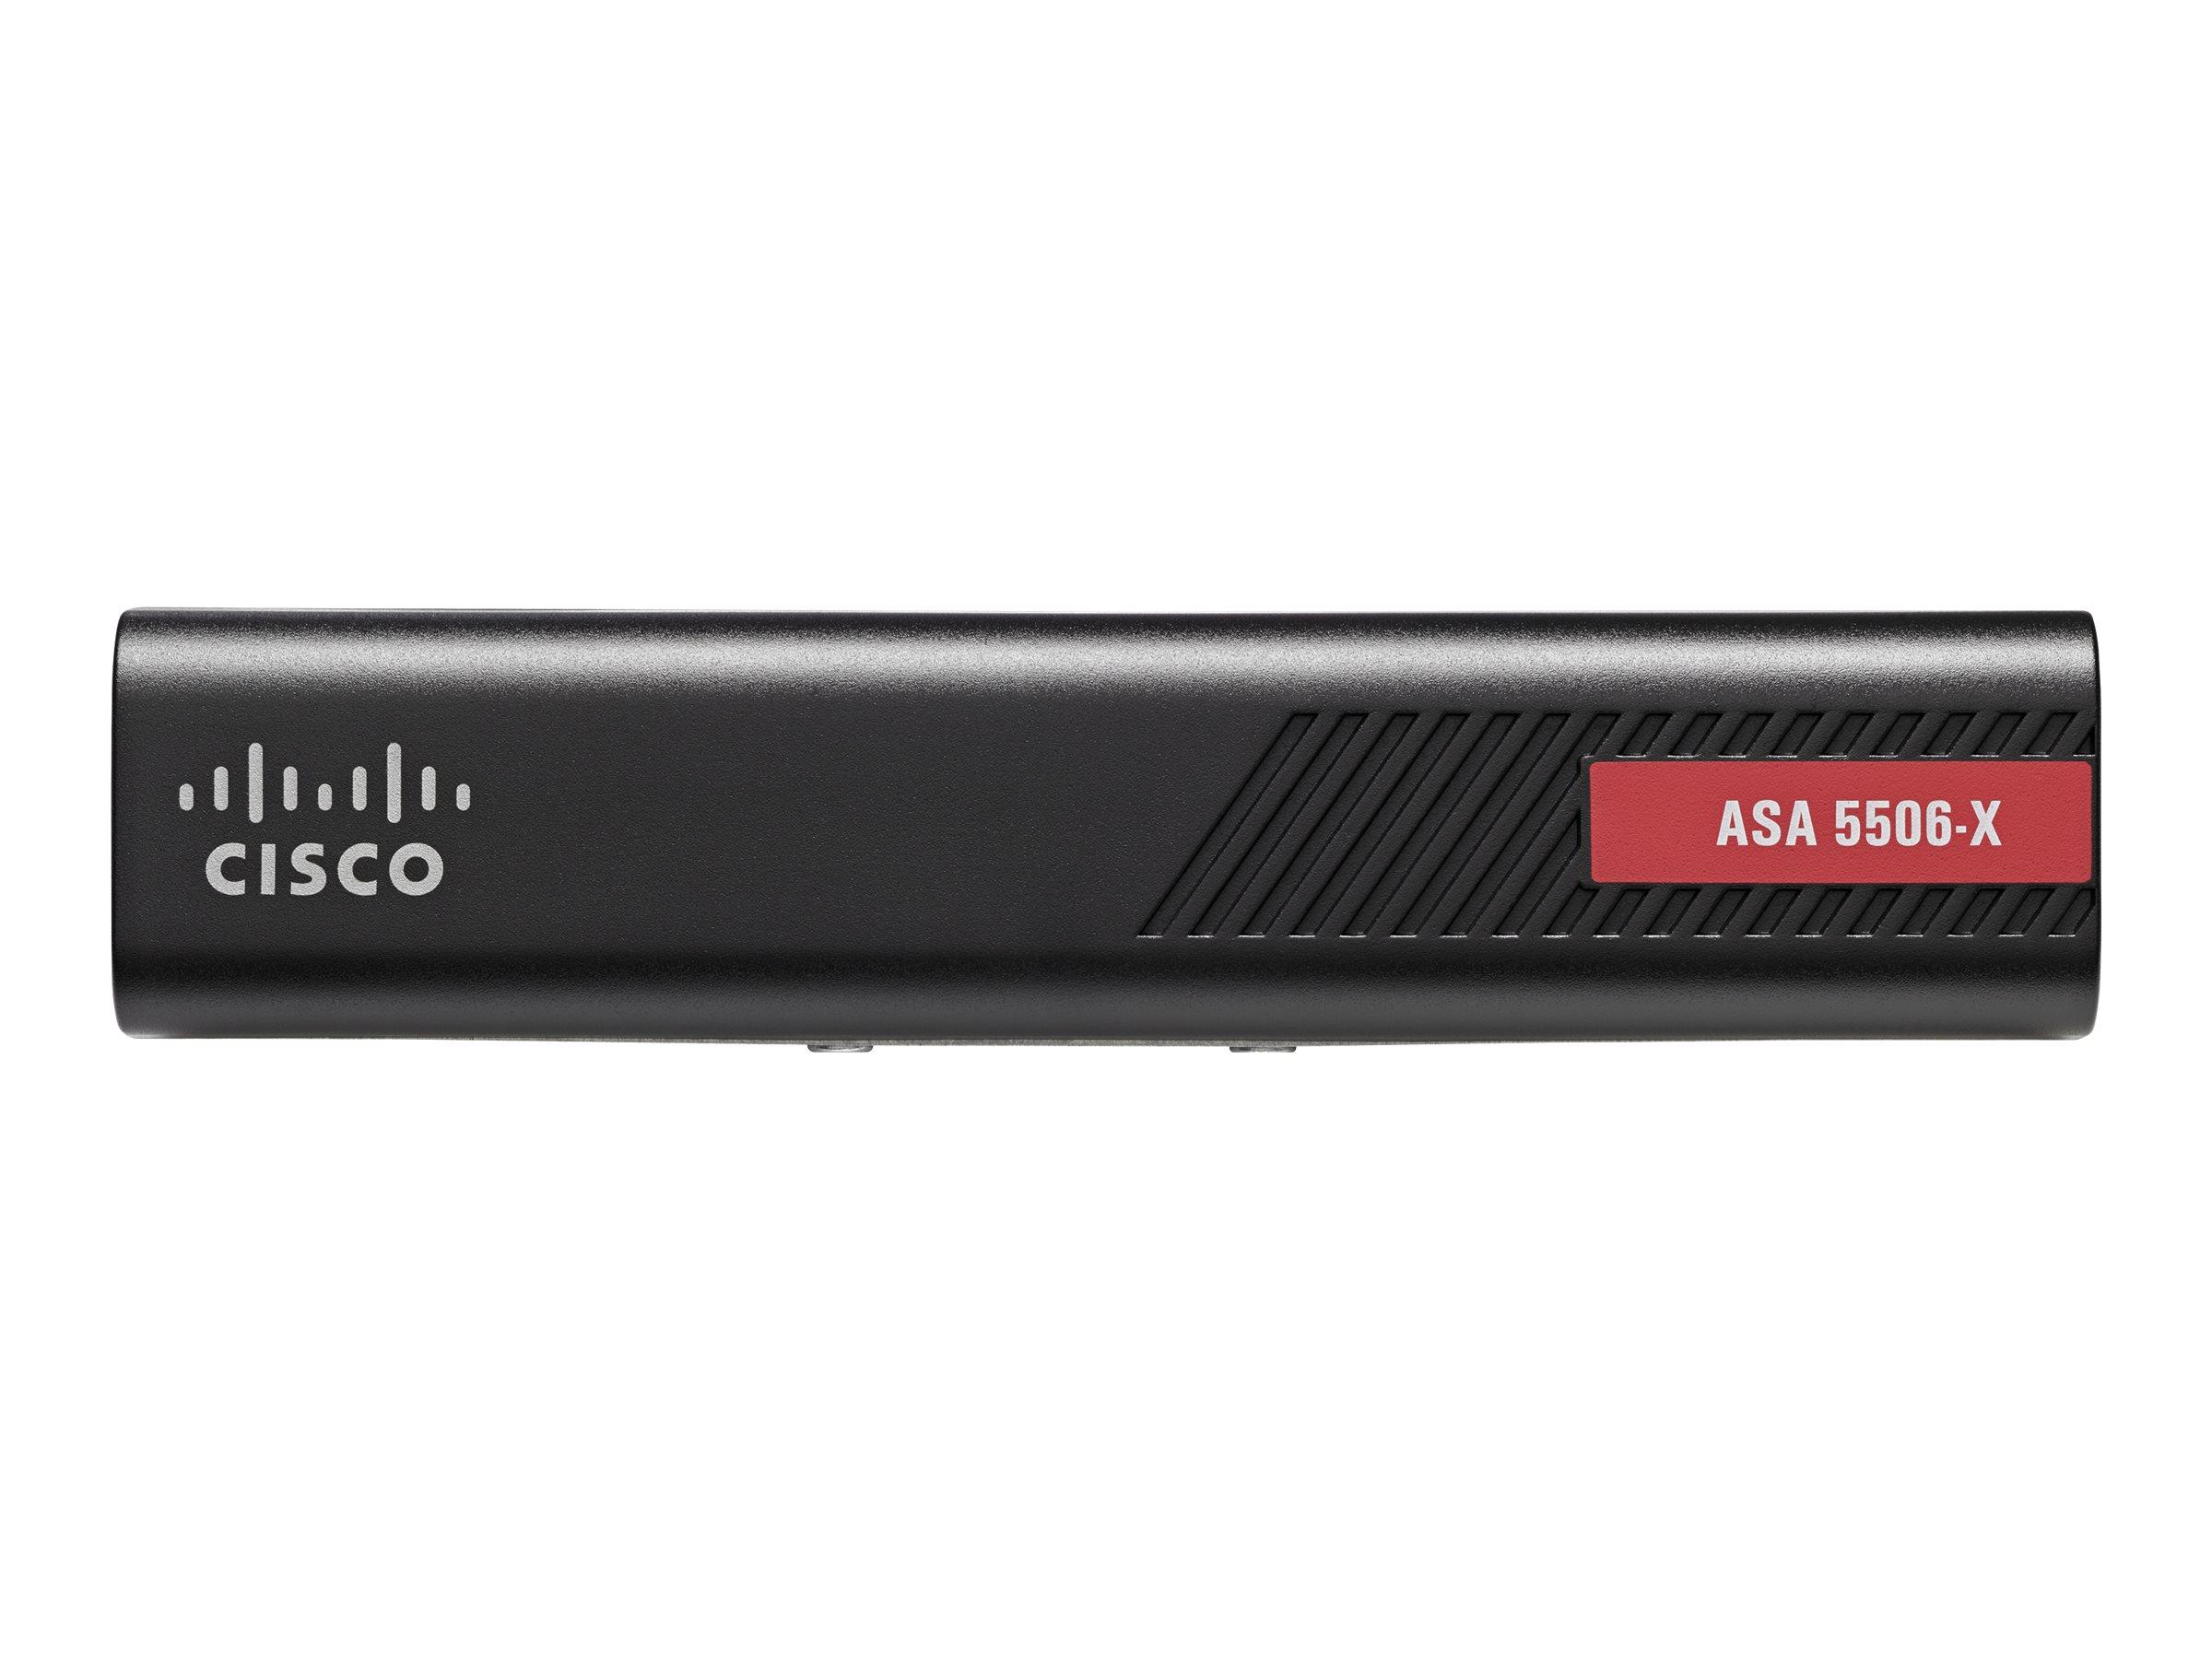 Cisco ASA 5506-X with FirePOWER Services - Sicherheitsgerät - 8 Anschlüsse - GigE - Desktop